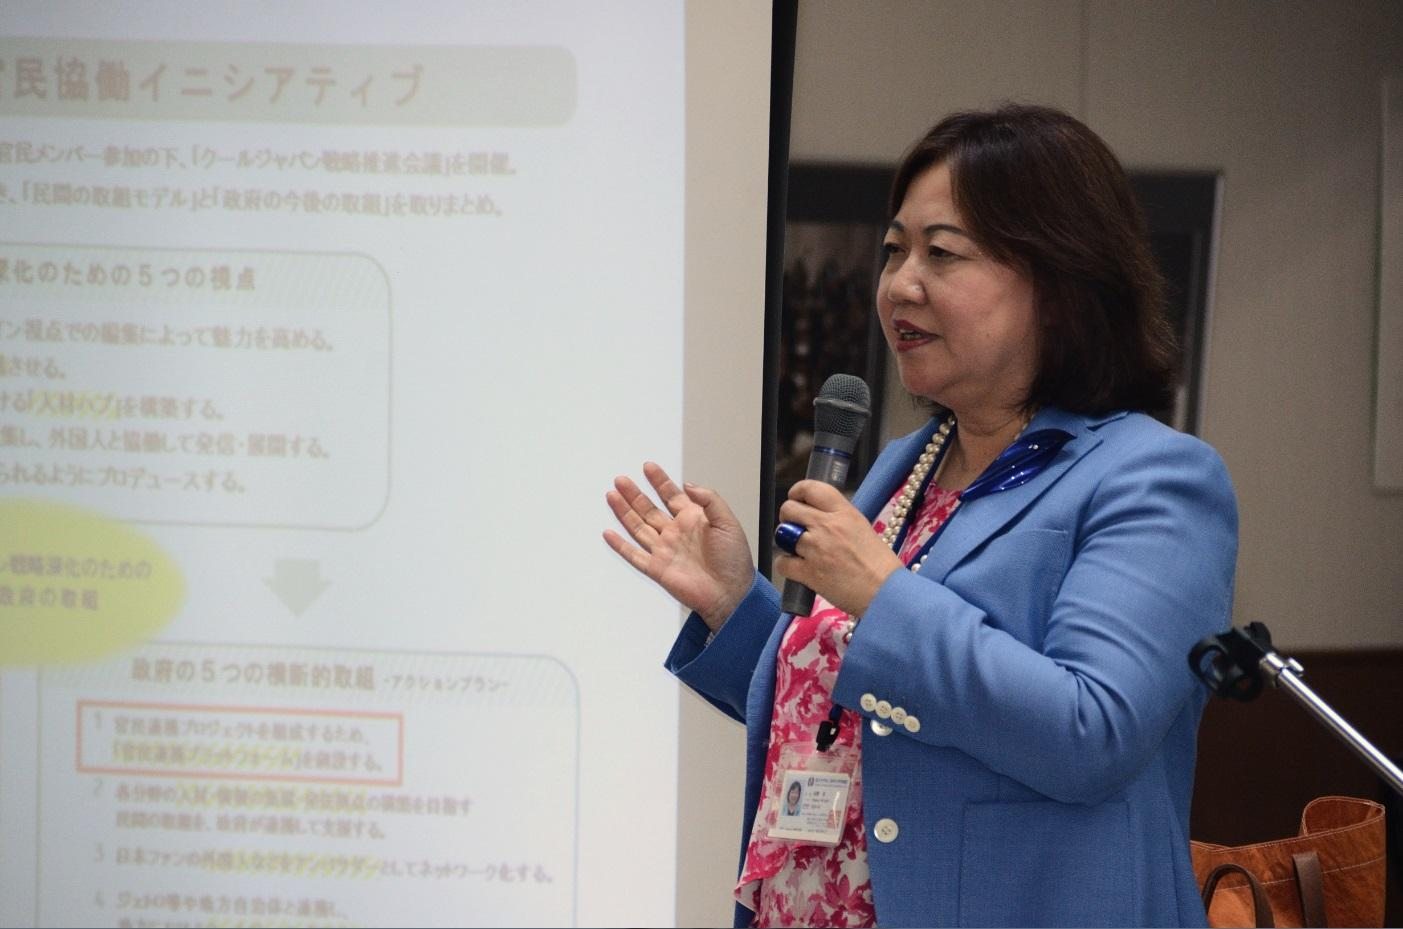 http://www.shinshu-u.ac.jp/institution/library/matsumoto/uploadimg/d253c94280a781f12a34f5a0f5b4fe83_1.jpg